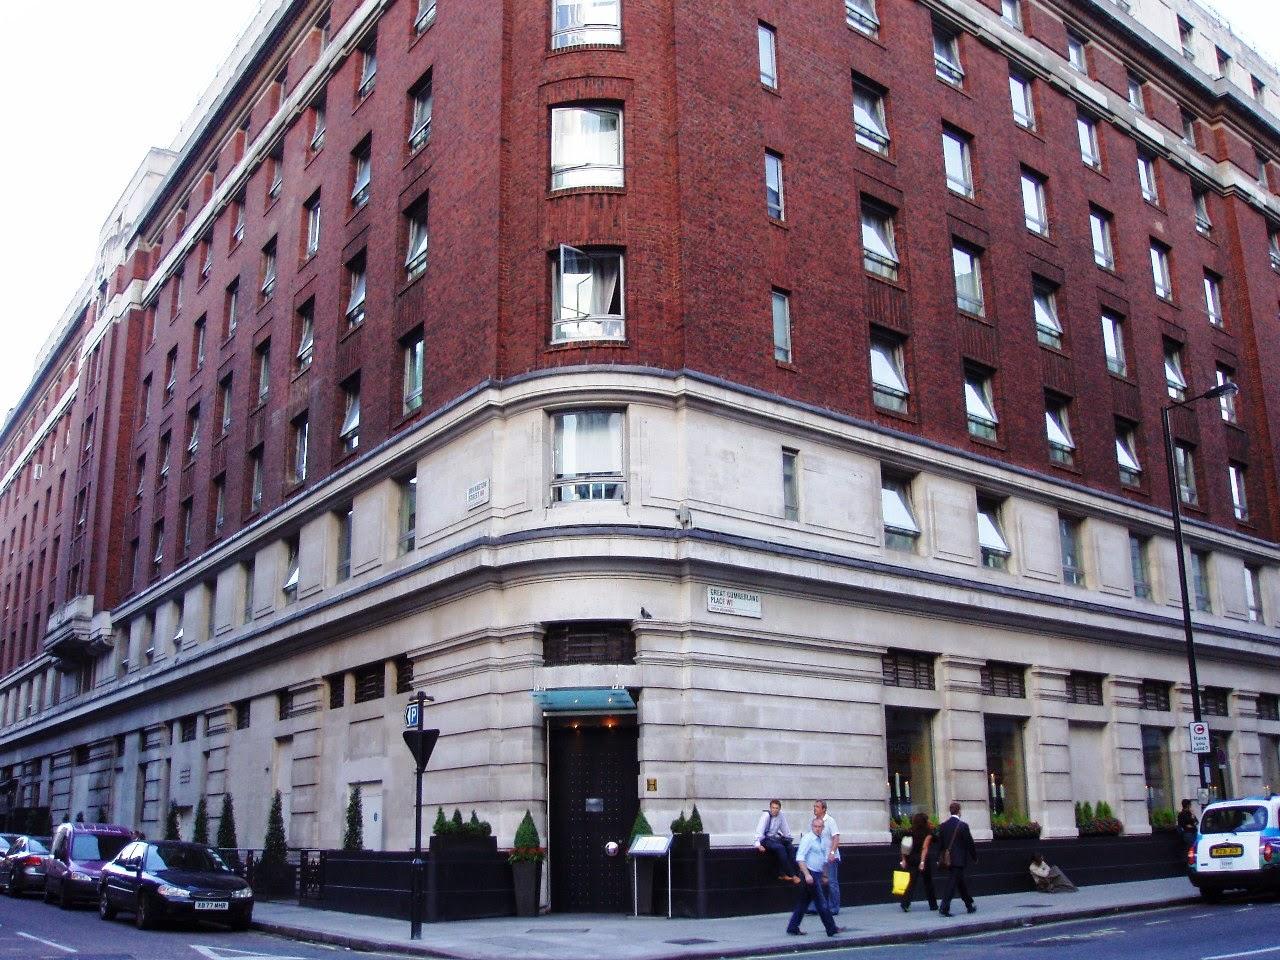 Cumberland Hotel London Email Addreb